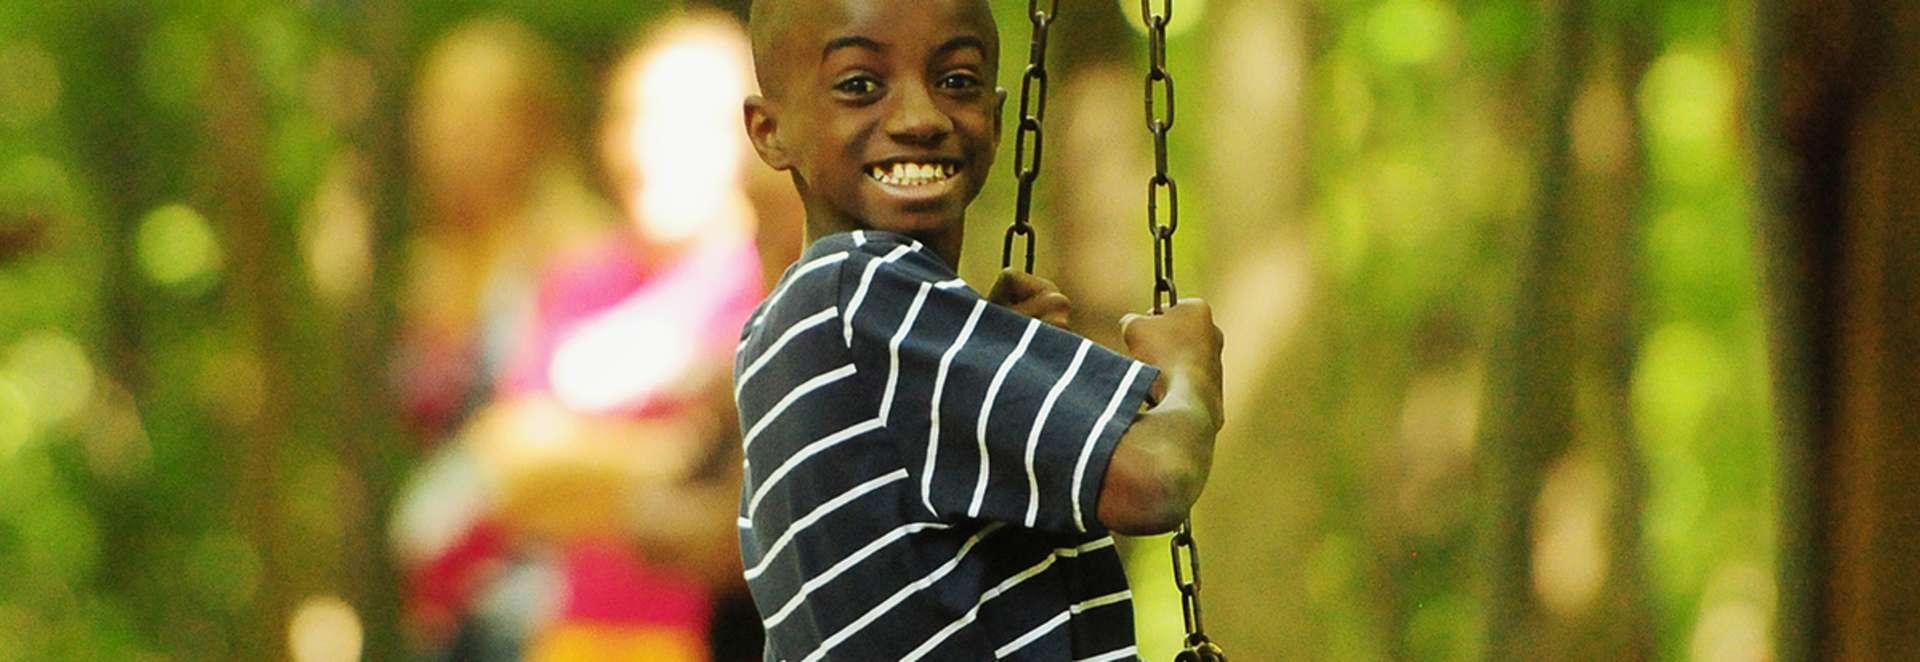 koa-canandaigua-people-boy-smiling-on-zipline